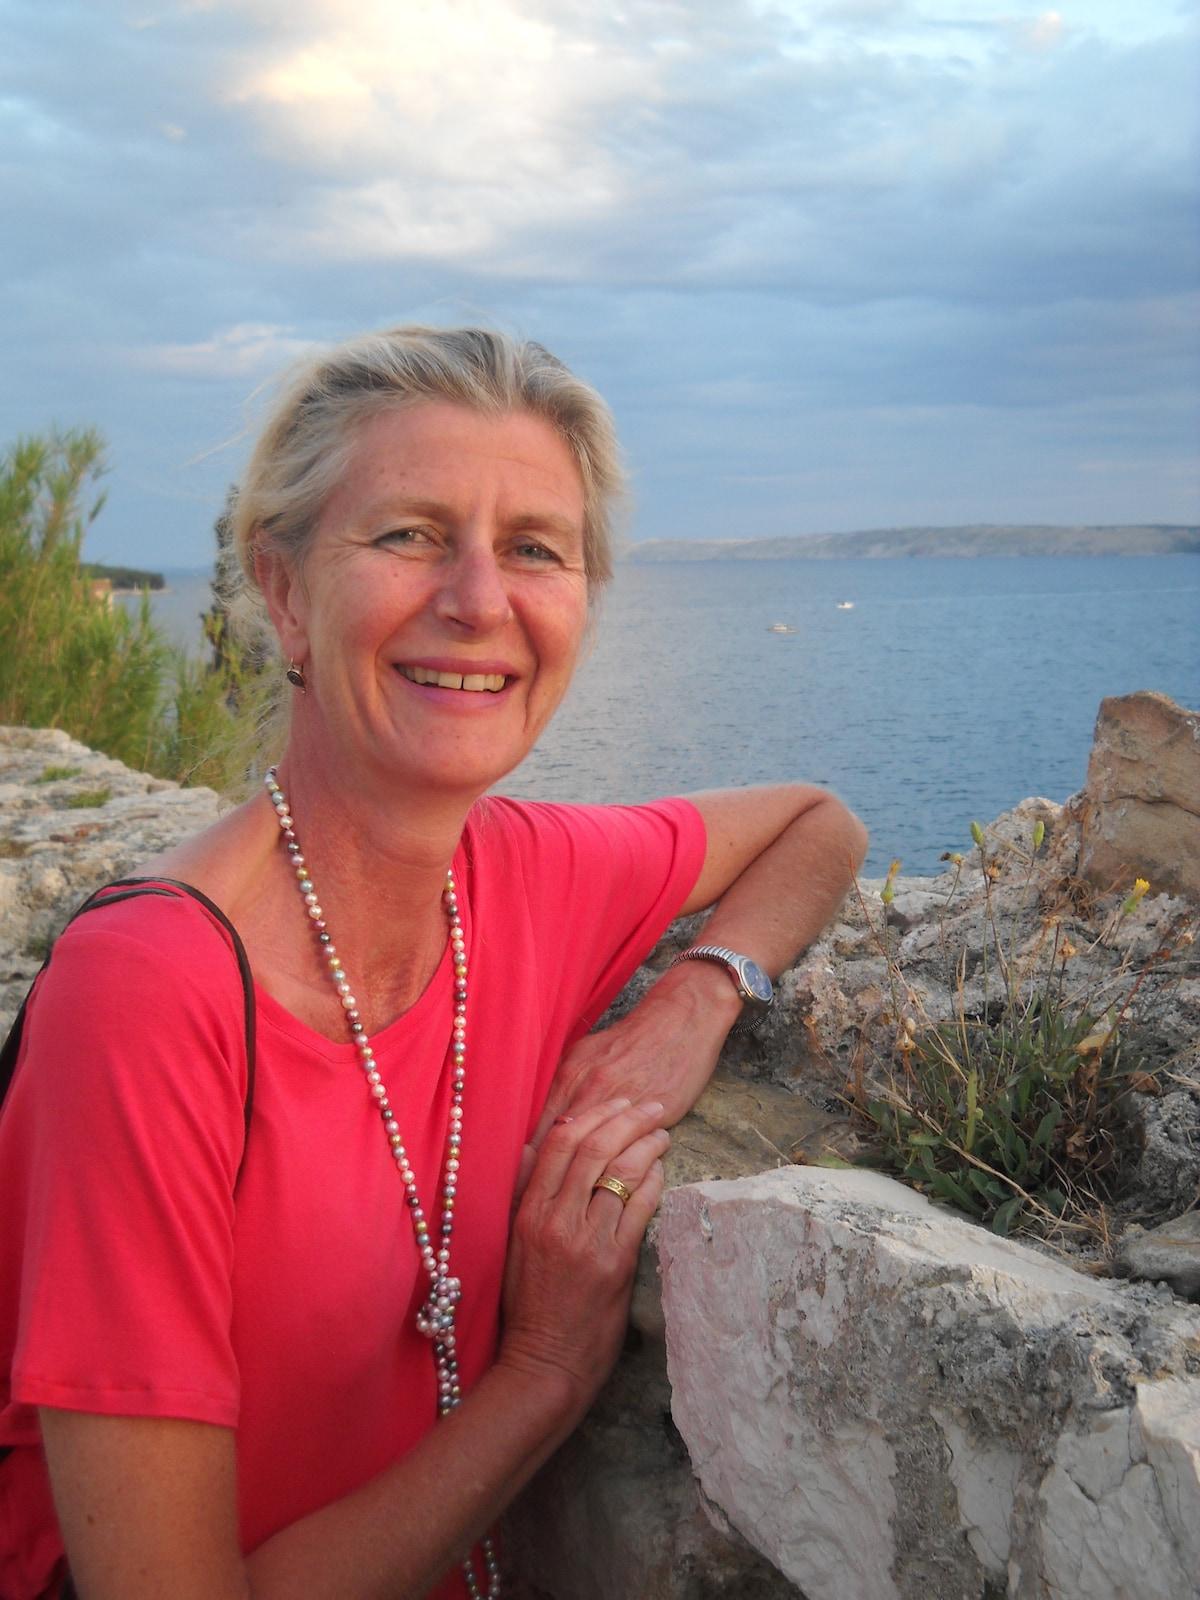 Annette from Castel Rigone